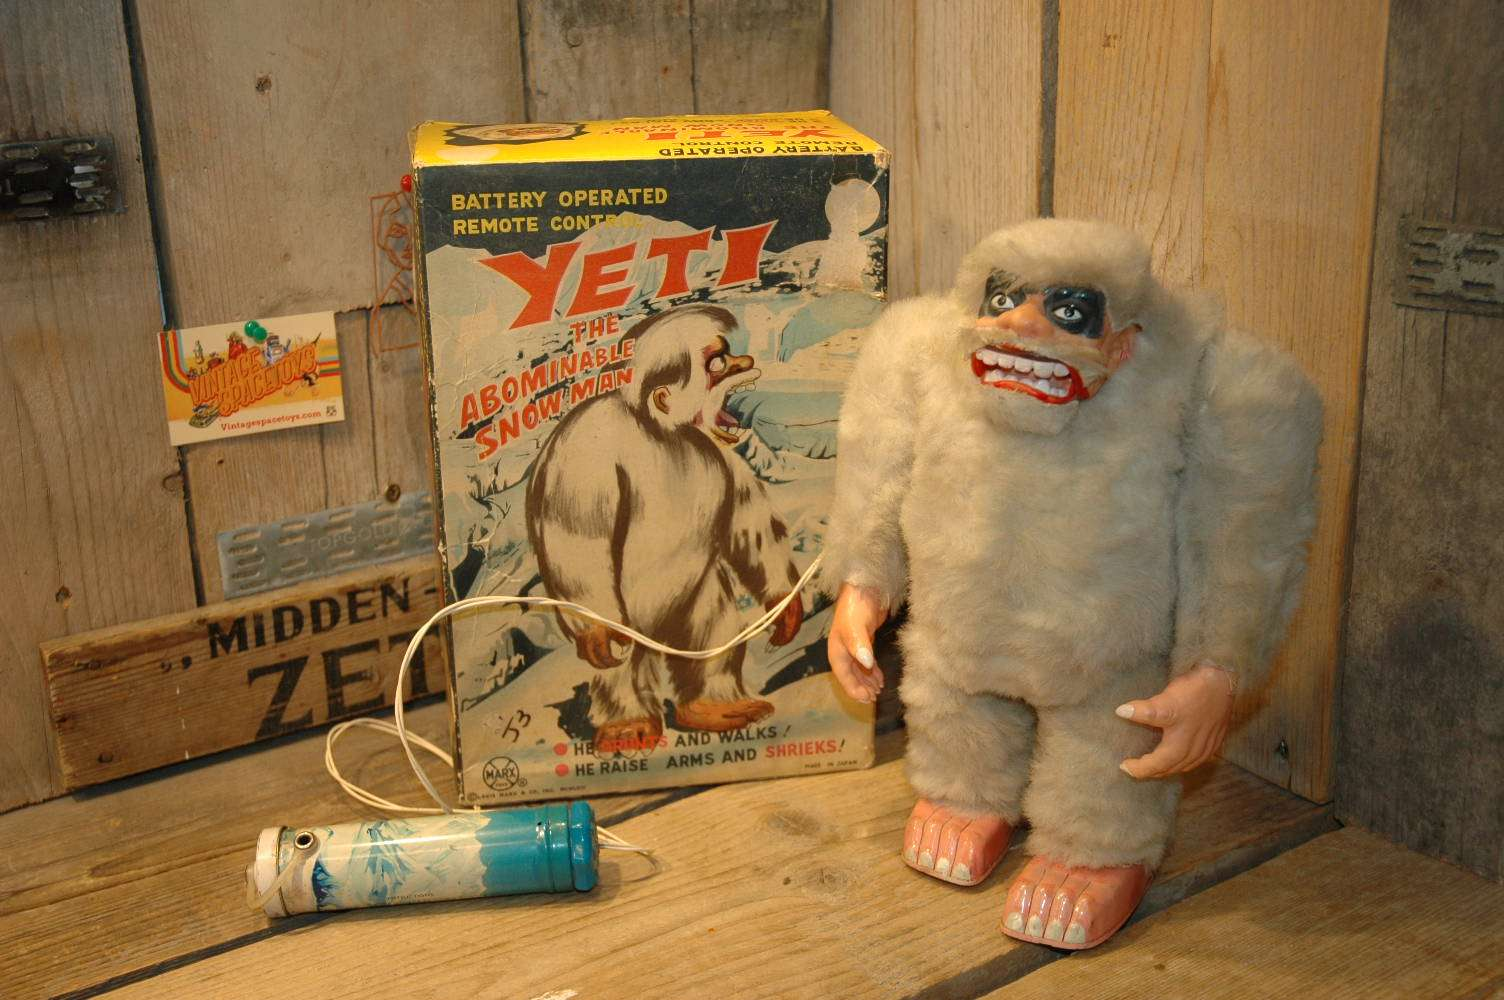 Marx Toys - Yeti The Abominable Snow Man